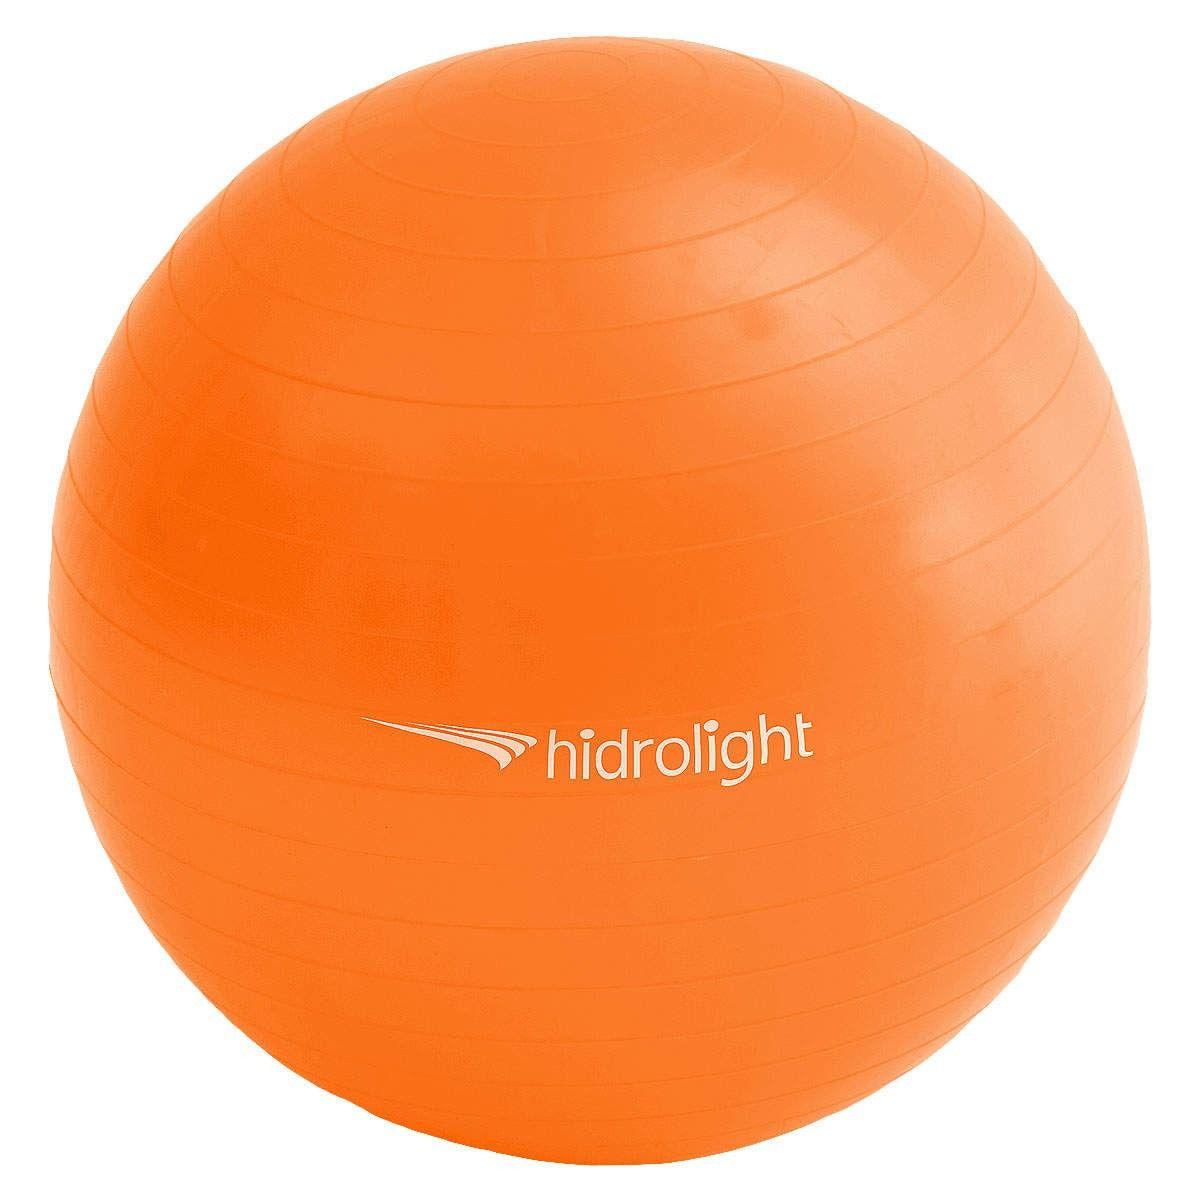 Bola para Ginástica 55cm Hidrolight Laranja - Fisioterapia, Pilates e Fitness